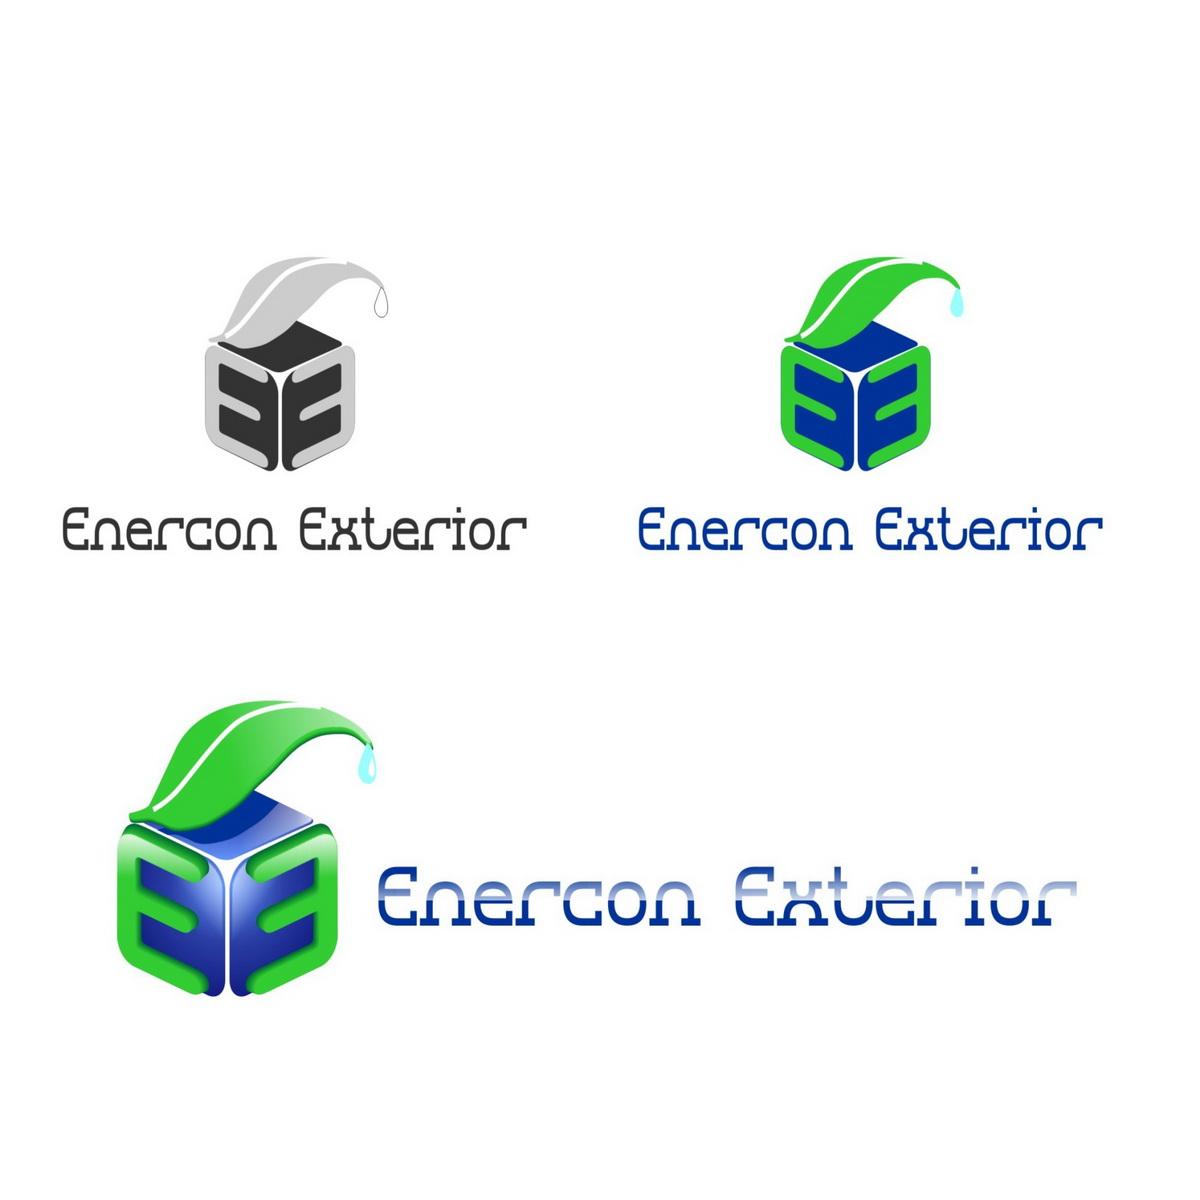 Logo Design by Naevio - Entry No. 53 in the Logo Design Contest Enercon Exteriors.